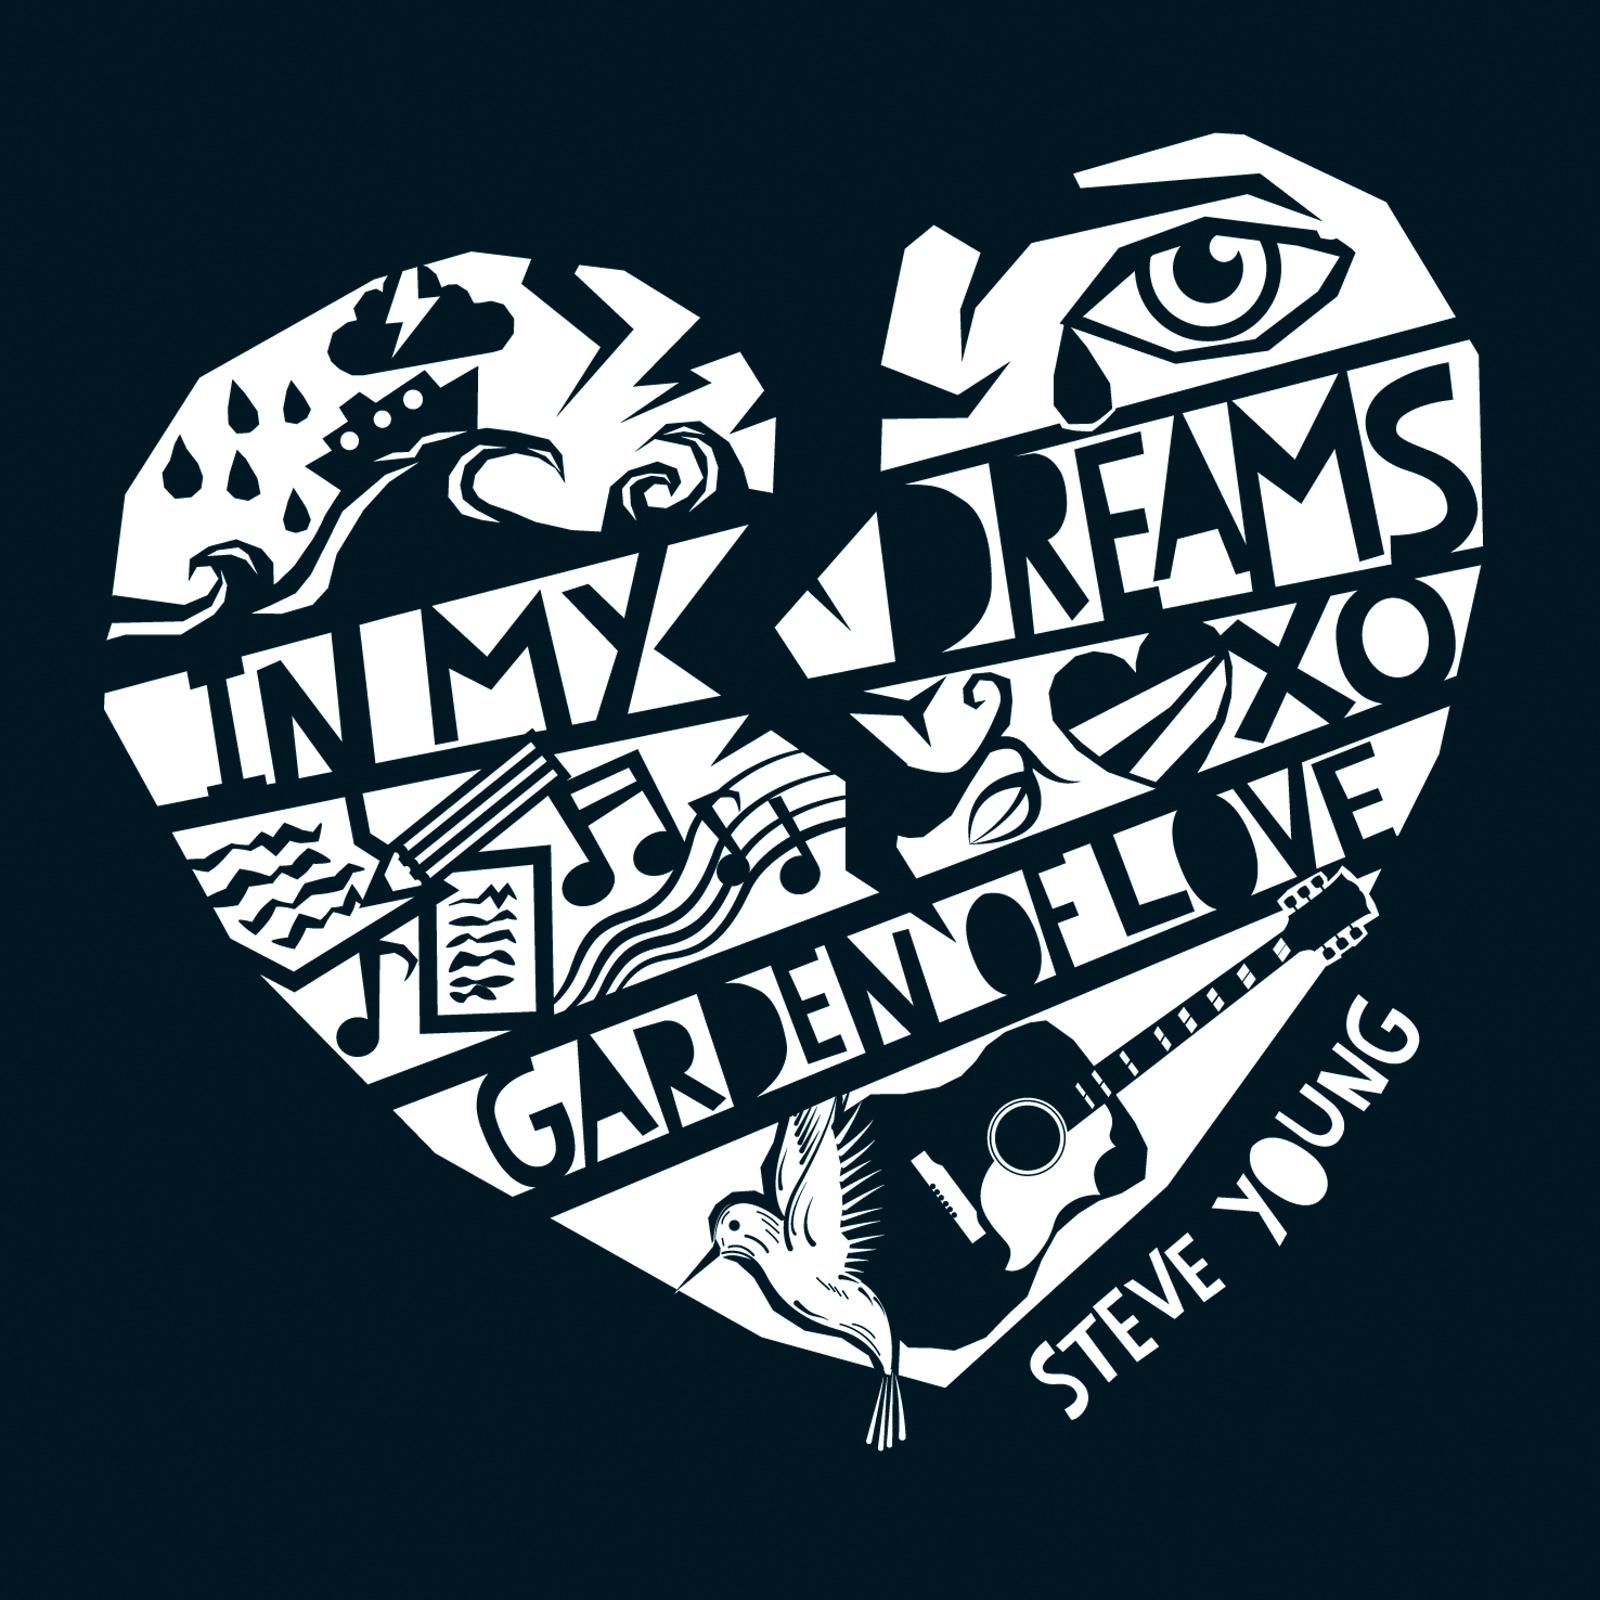 Garden Of Love (Radio Edit MP3) - Steve Young